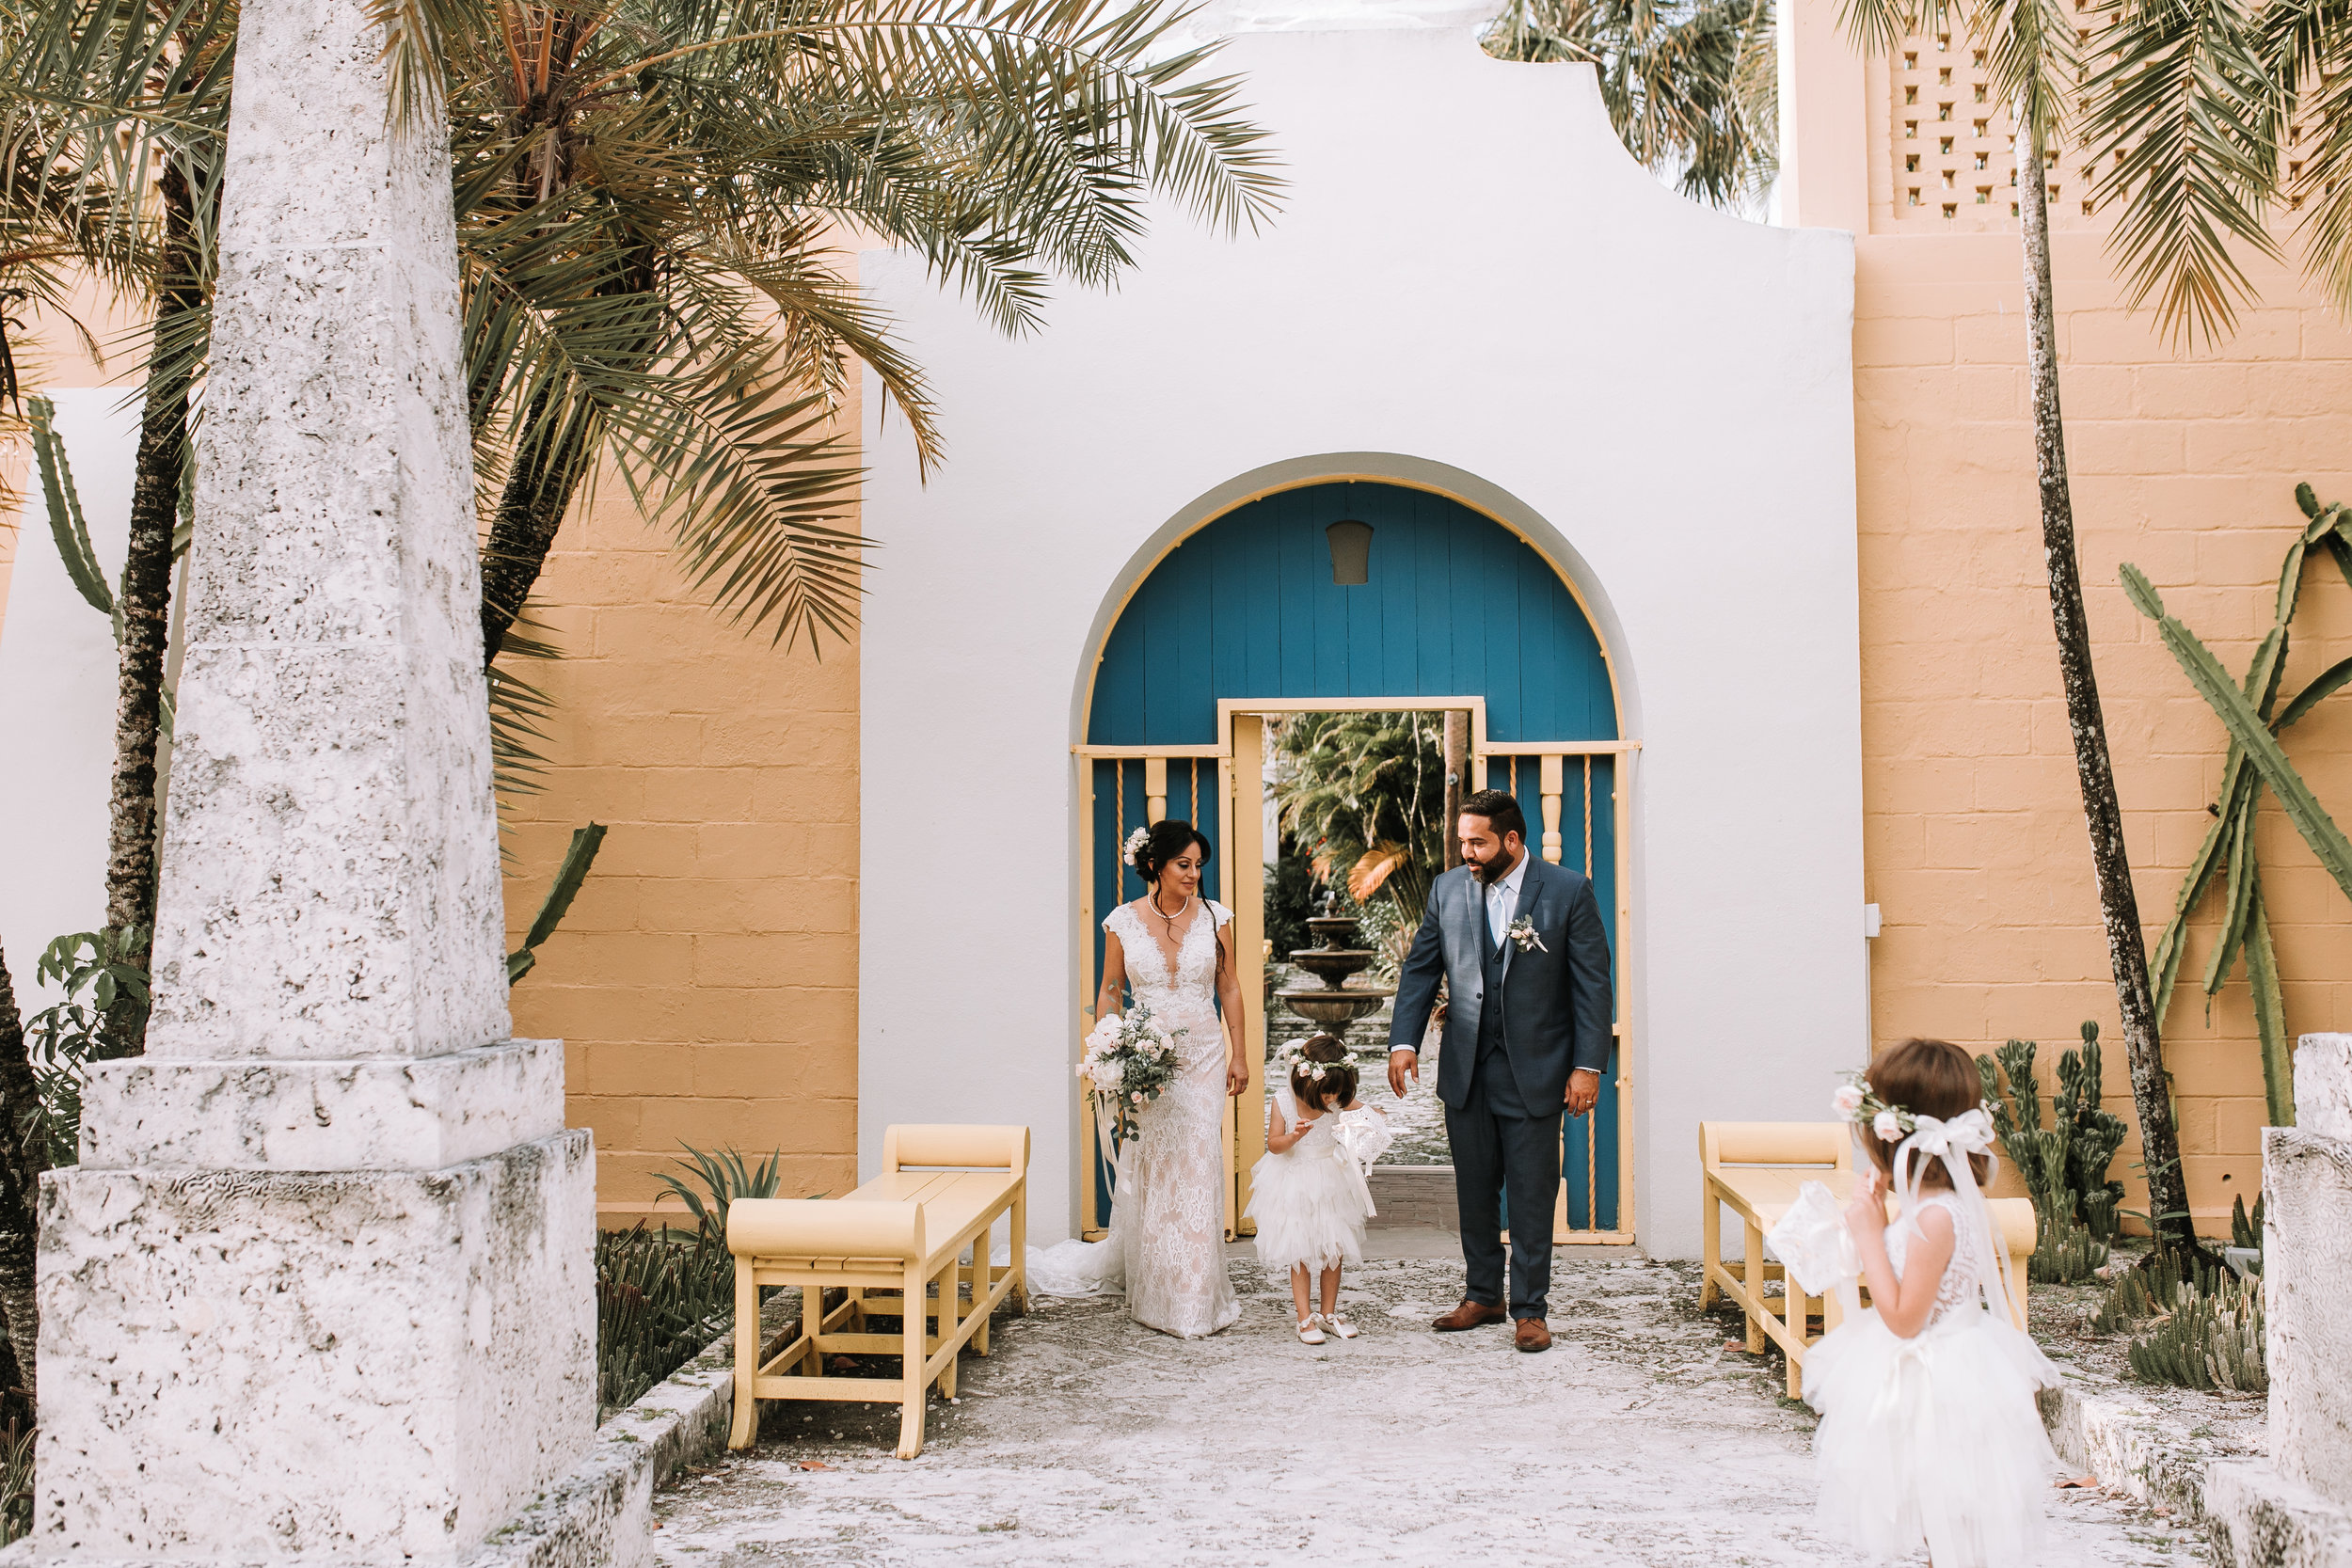 Bonett-House-wedding-fort-lauderdale-florida-Rkm-Photography-242.jpg